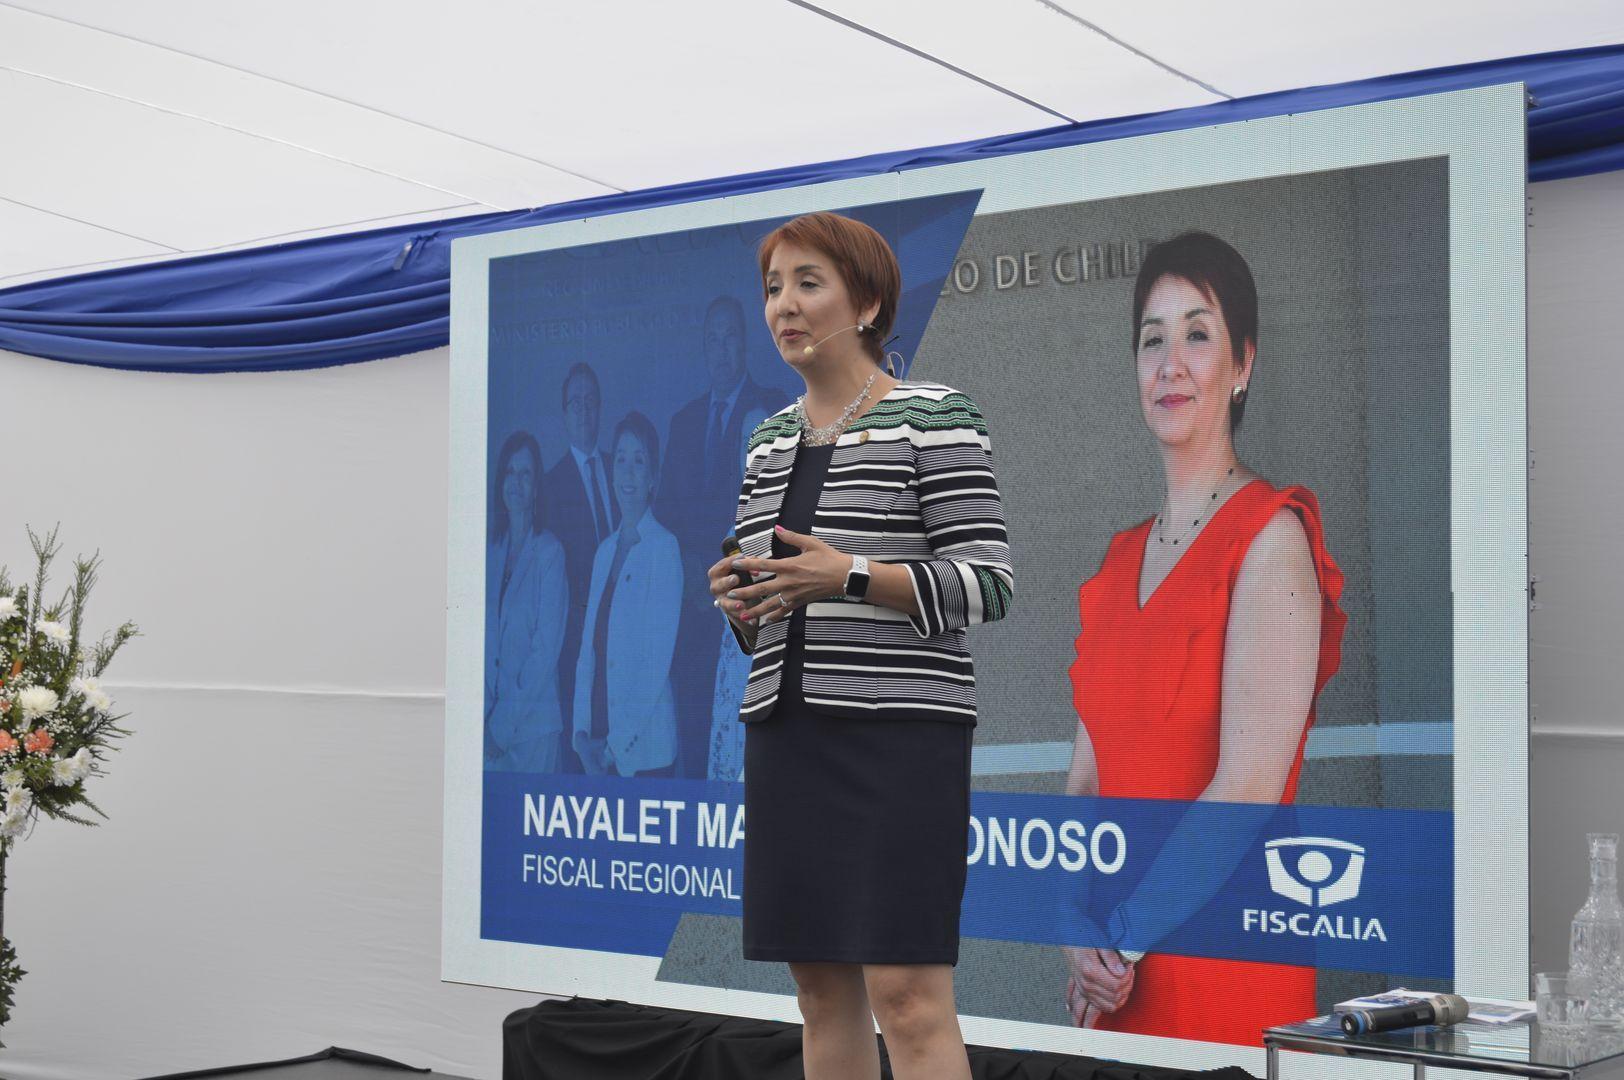 Nayalet Mansilla, Fiscal Región de Ñuble